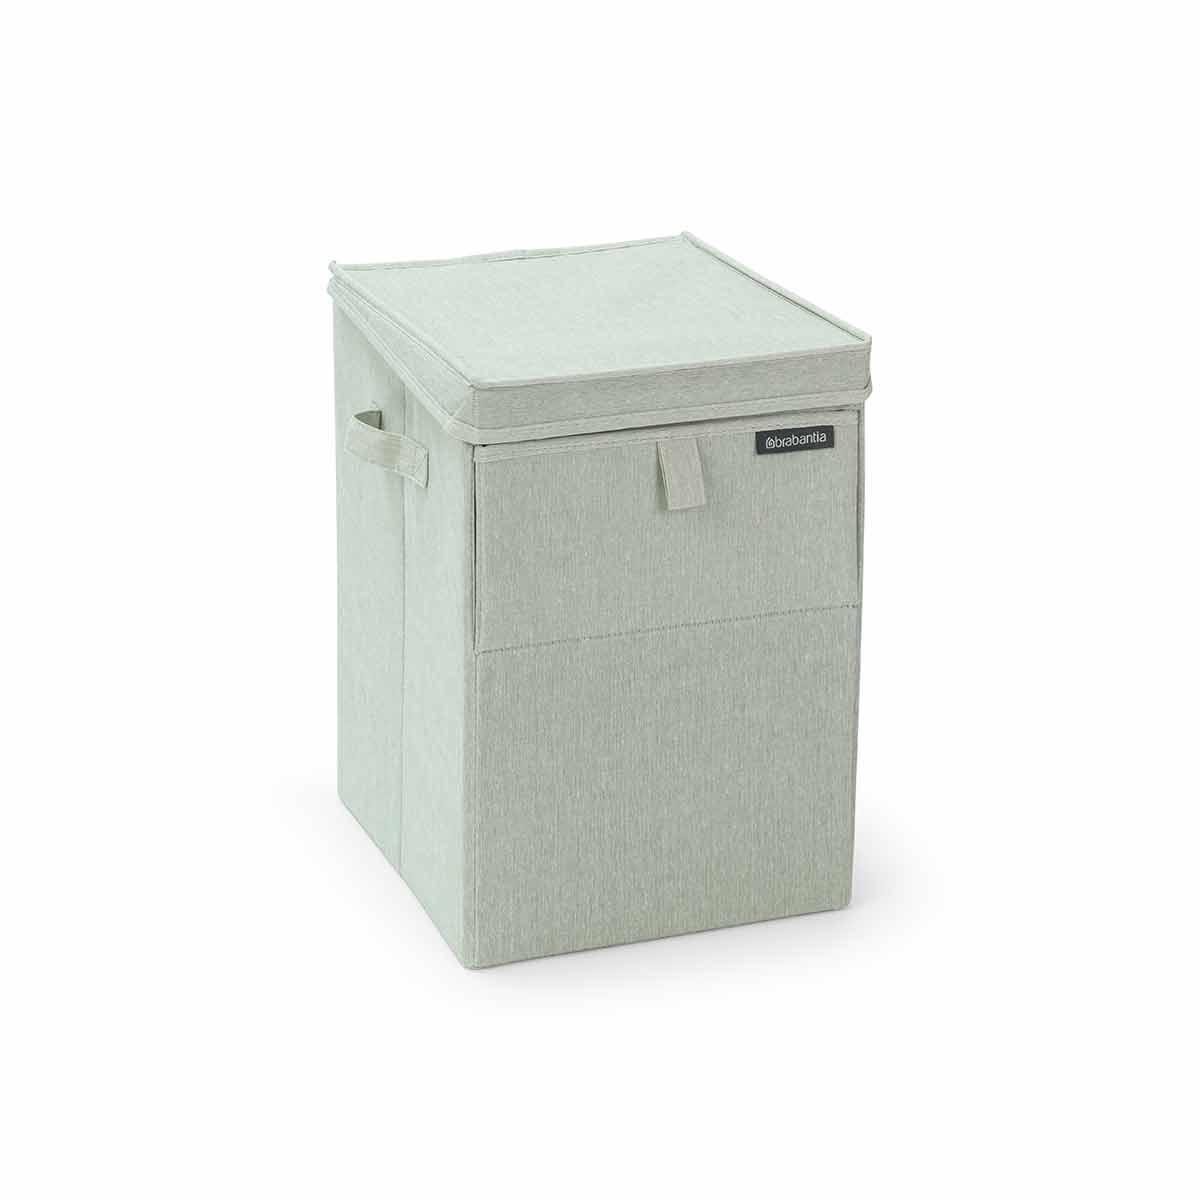 Brabantia Rectangular Laundry Box 35 Litre, Light Green